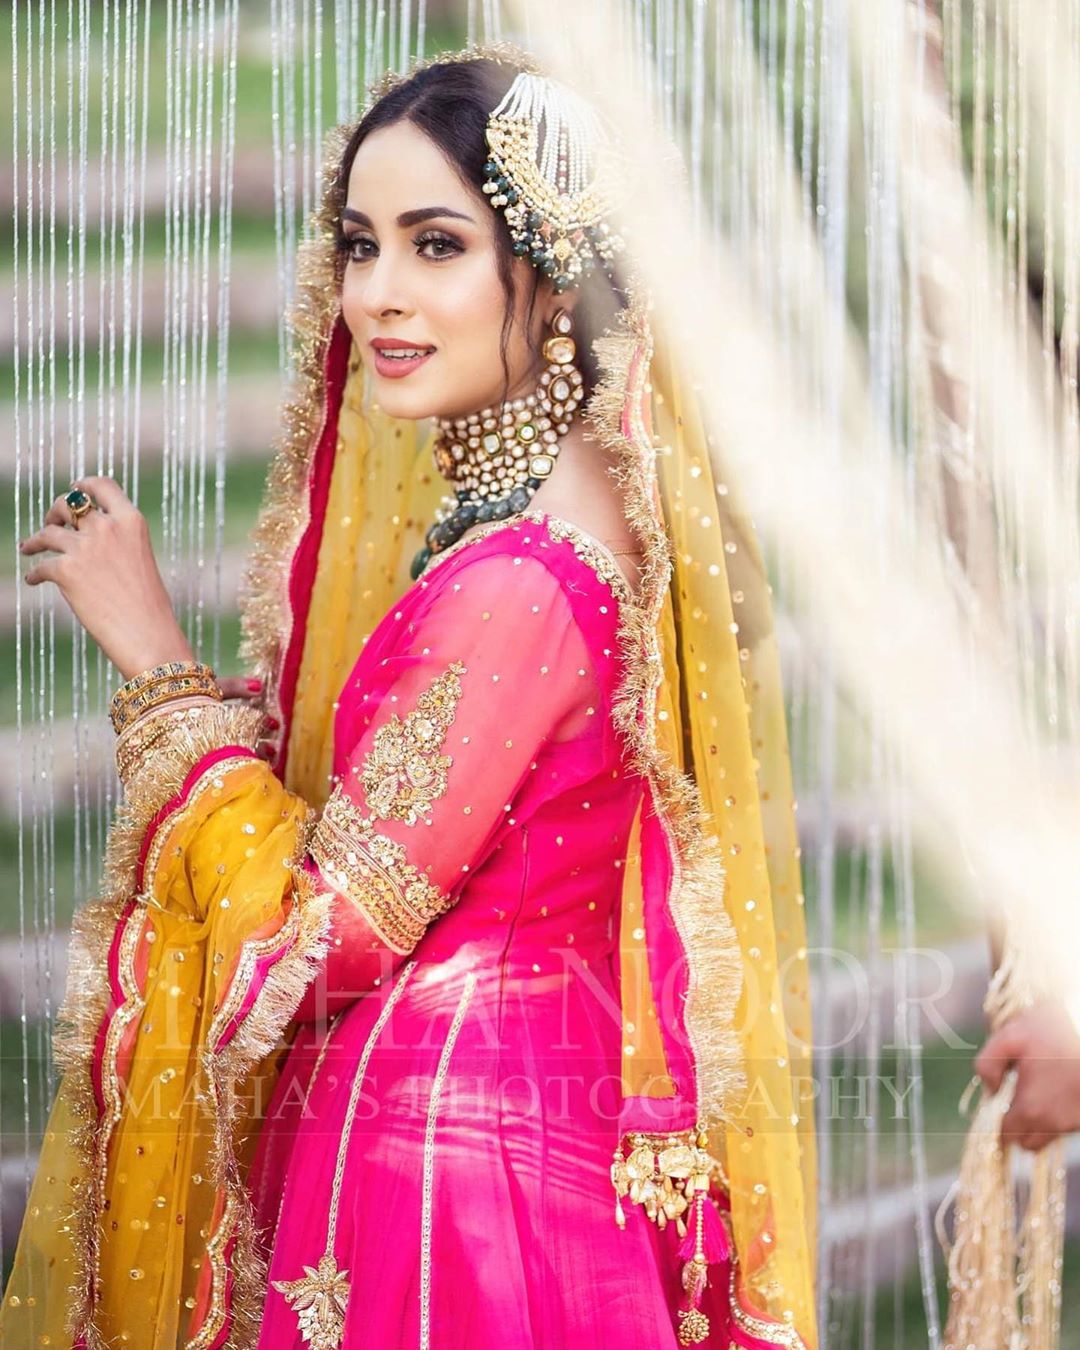 Nimra Khan is Looking Beautiful in her Latest Bridal Shoot for Faiza Salon